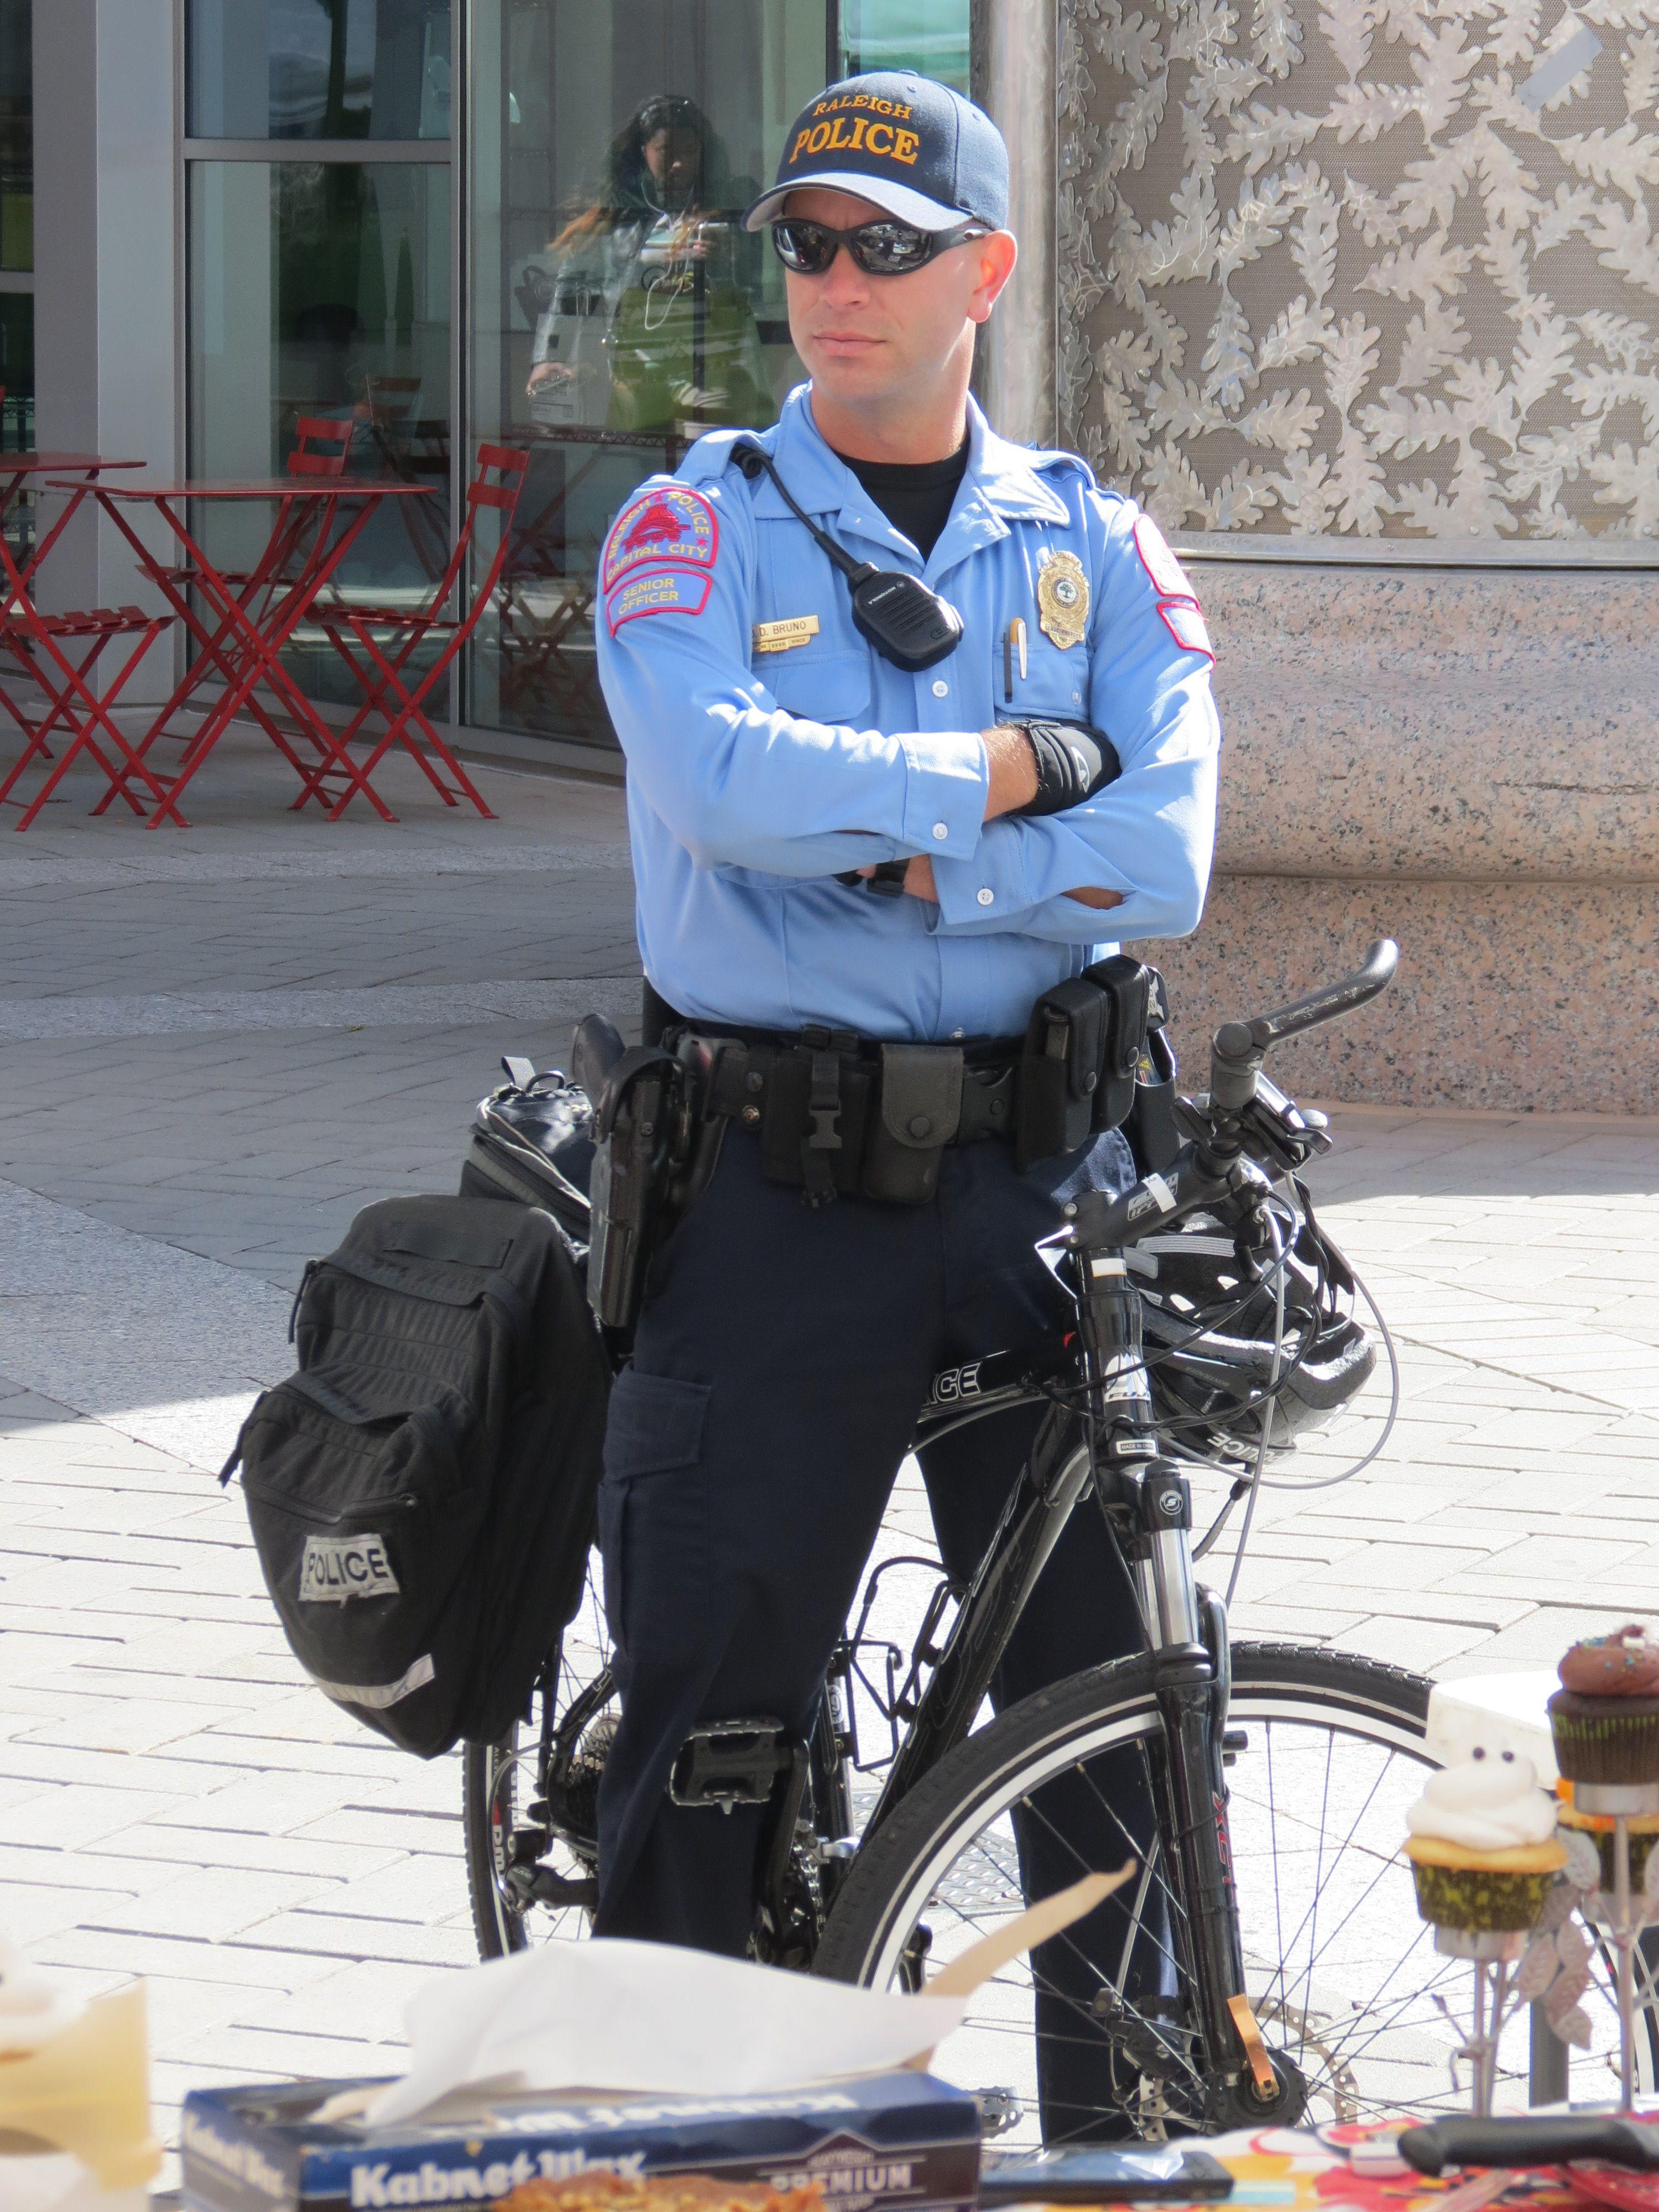 Raleigh Nc Police Police Uniforms Raleigh Police